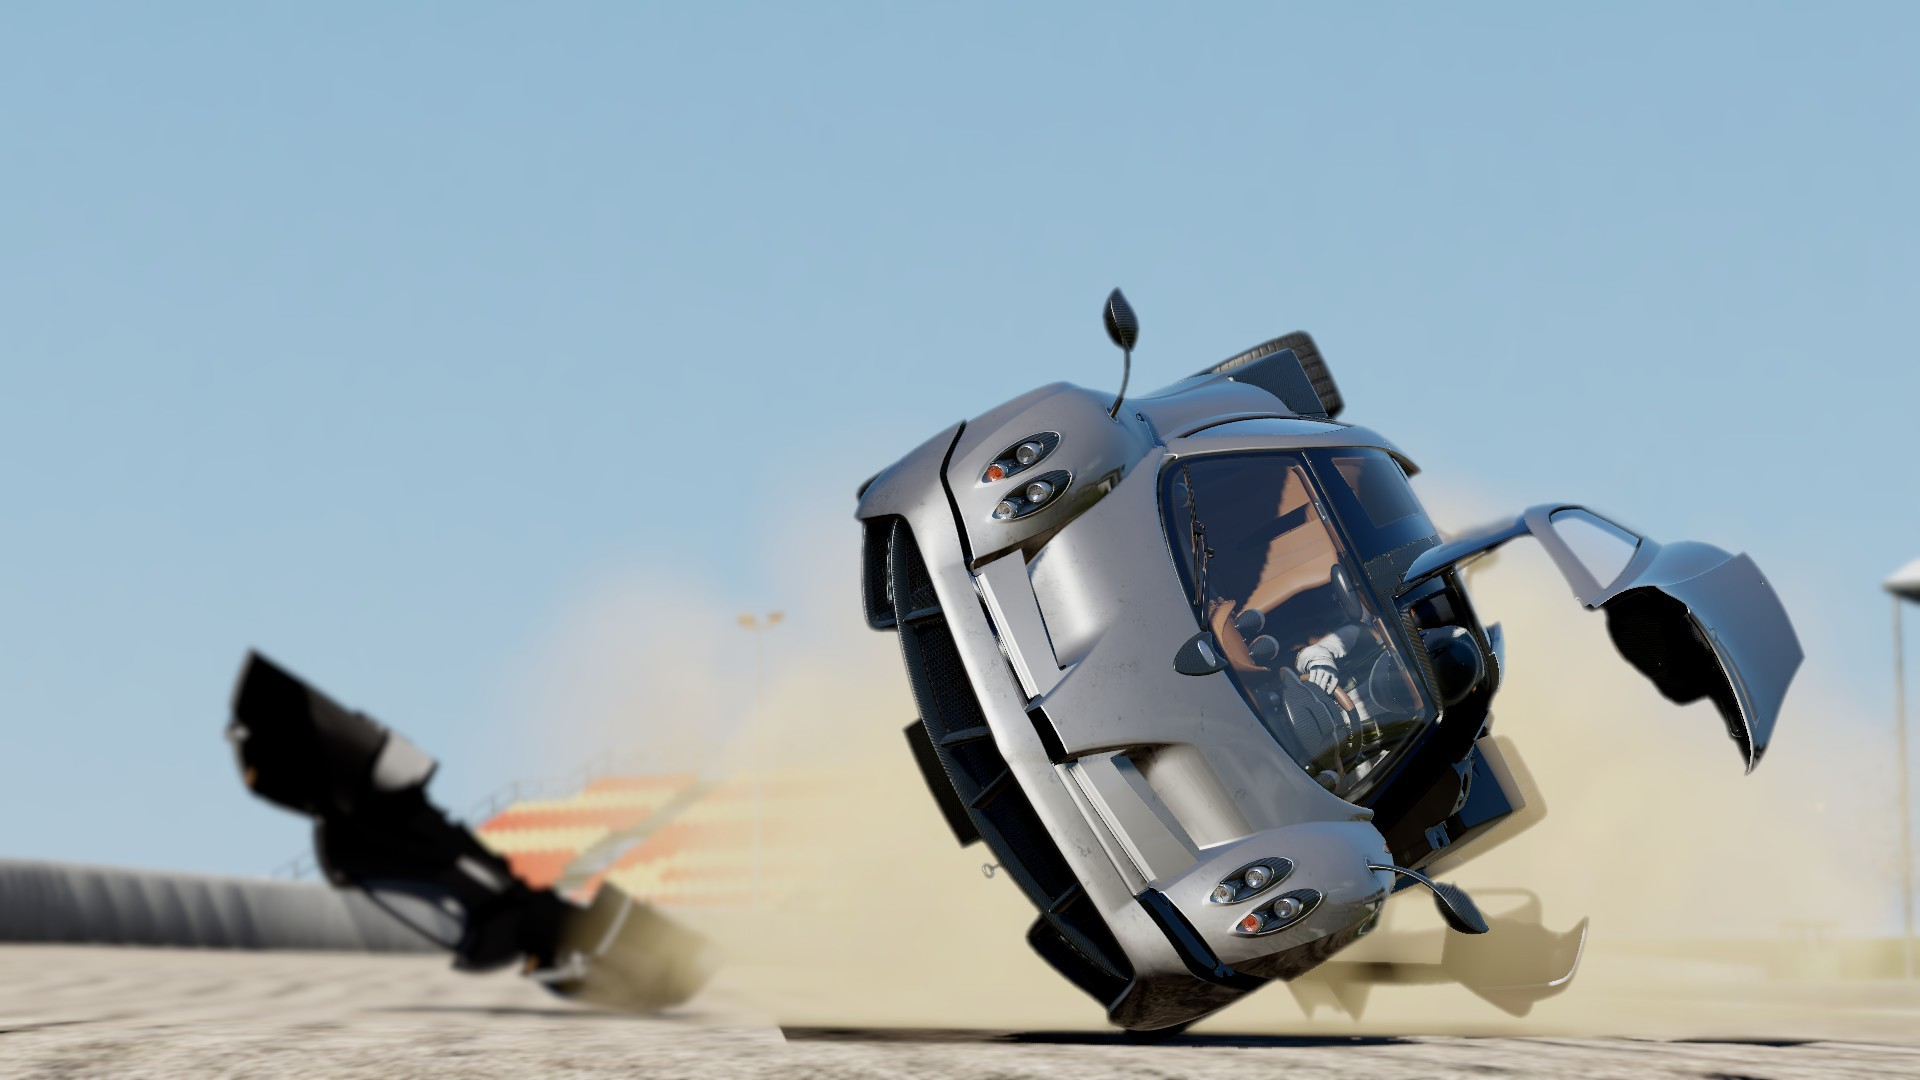 Huayra Crash Accident wreck racing supercars wallpaper background 1920x1080